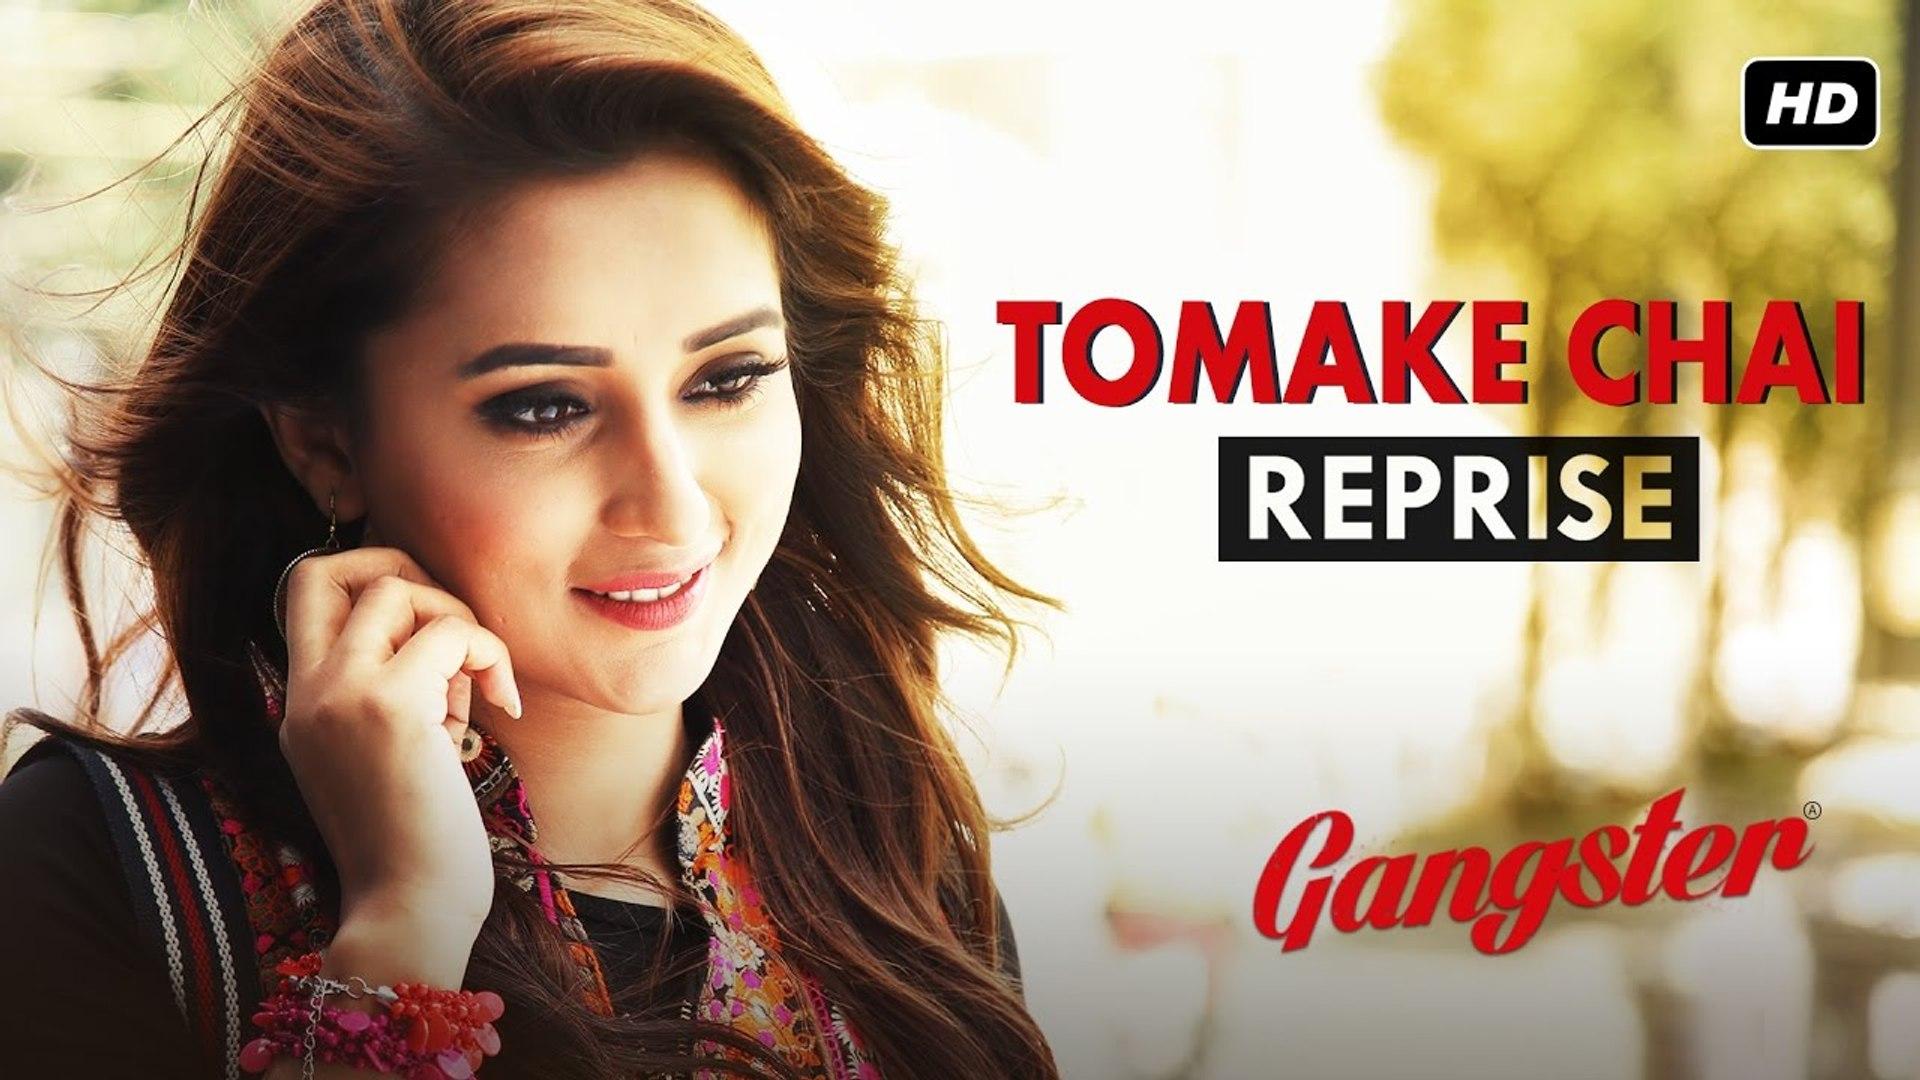 Tomake Chai Reprise Full Video Song Gangster Arindom Madhubanti Bagchi Birsa 2016 Salman Sheezan World Video Dailymotion